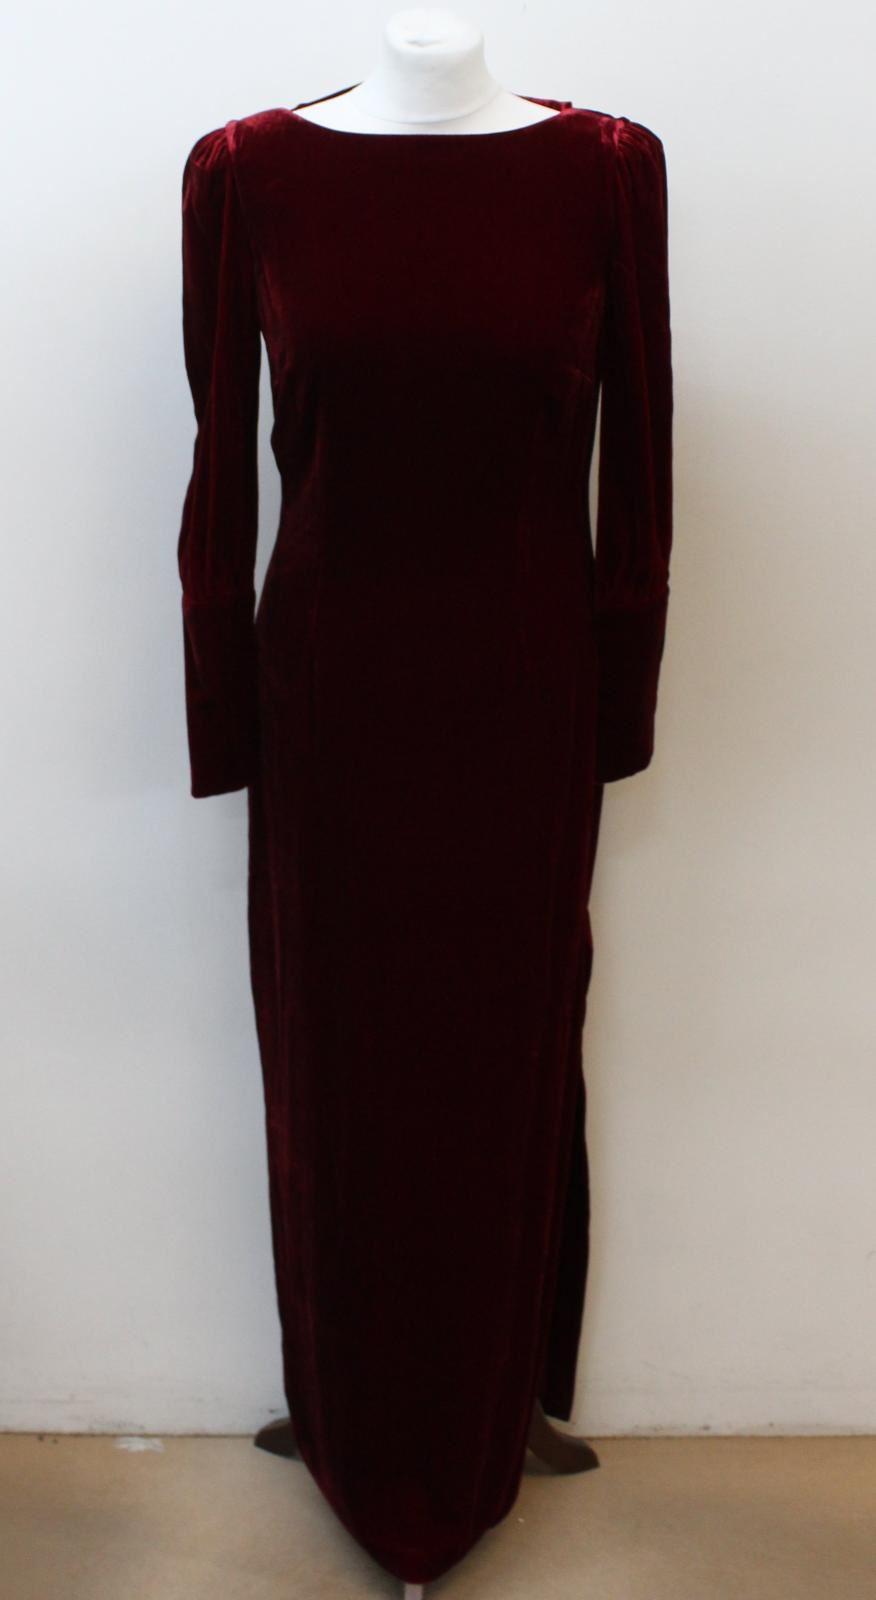 BIBA-Ladies-Deep-Red-Long-Sleeve-Cut-Out-Back-Velvet-Maxi-Dress-UK12-EU40